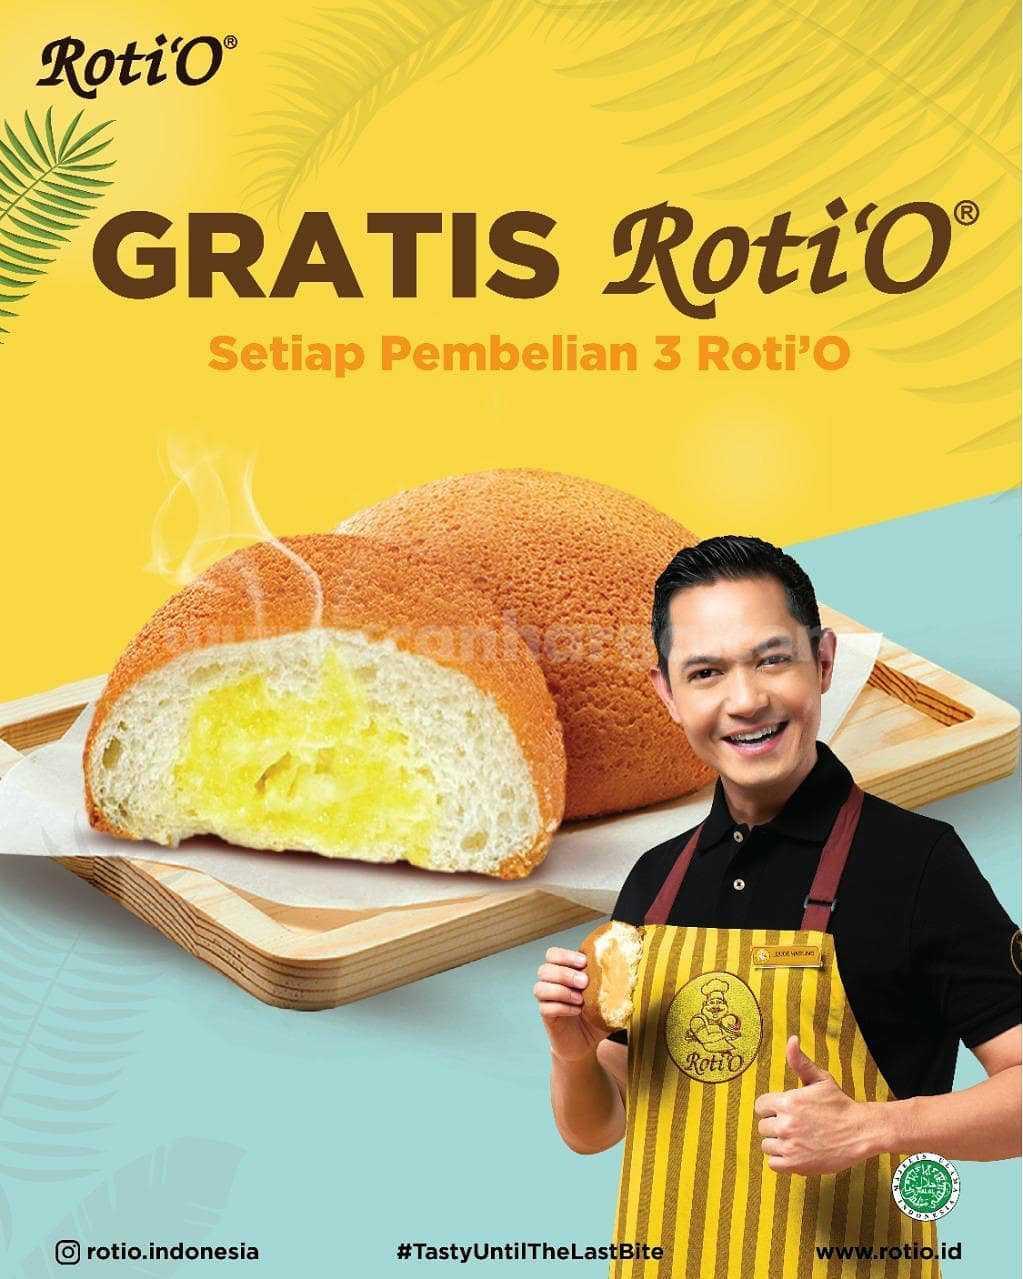 Promo Roti O Spesial JUNI - Beli 3 Gratis 1 Roti'O 1